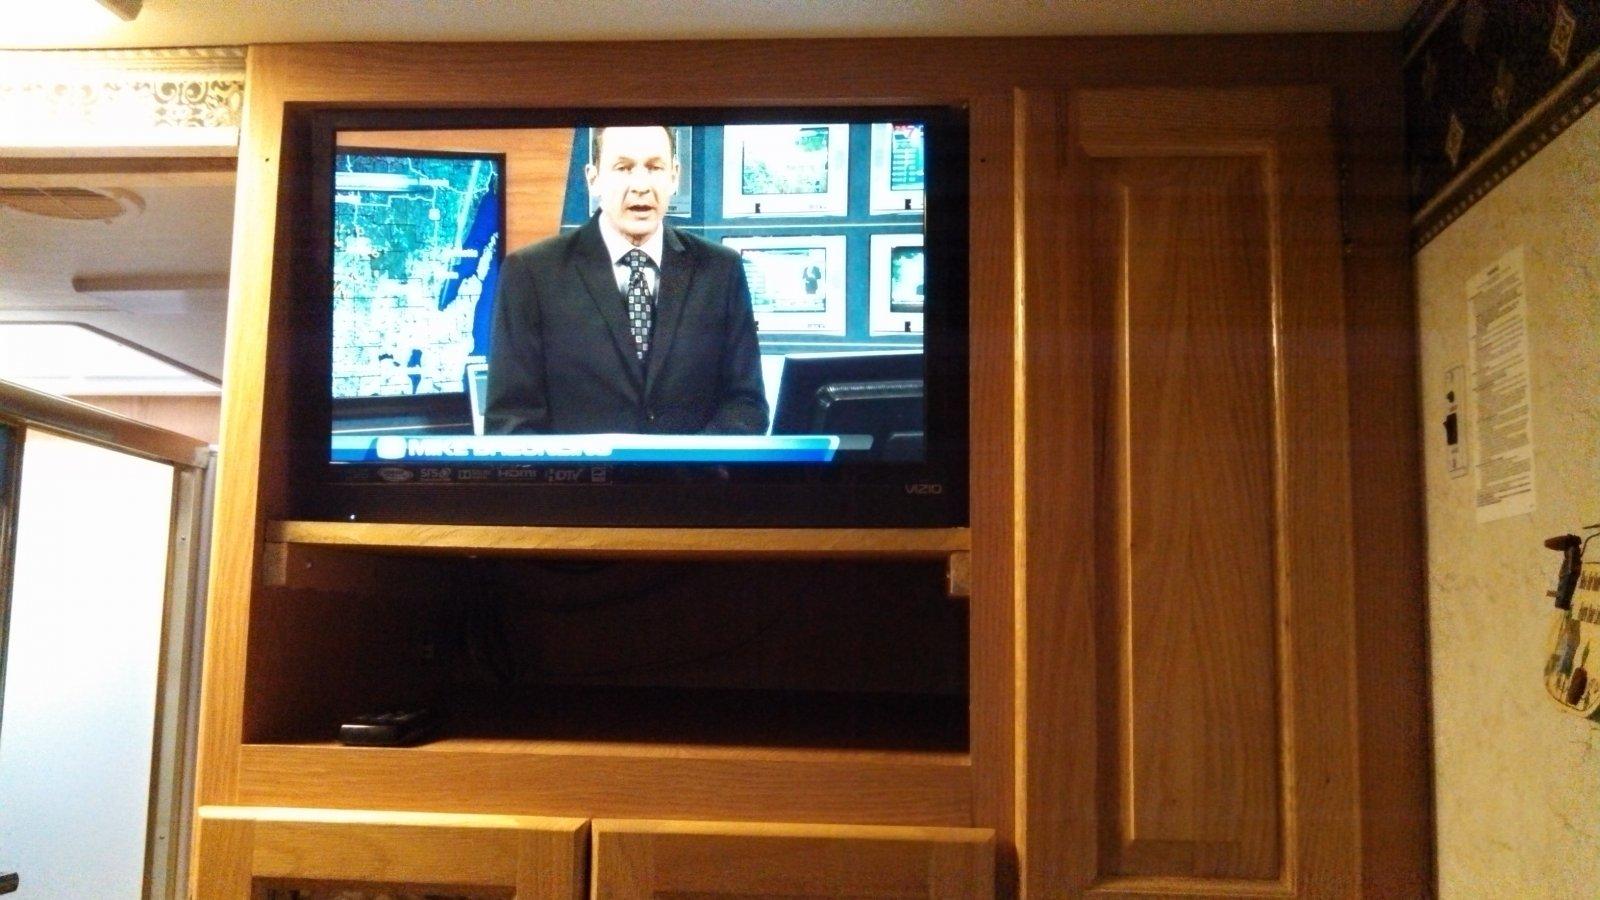 Click image for larger version  Name:Bedroom TV.jpg Views:41 Size:205.8 KB ID:41704